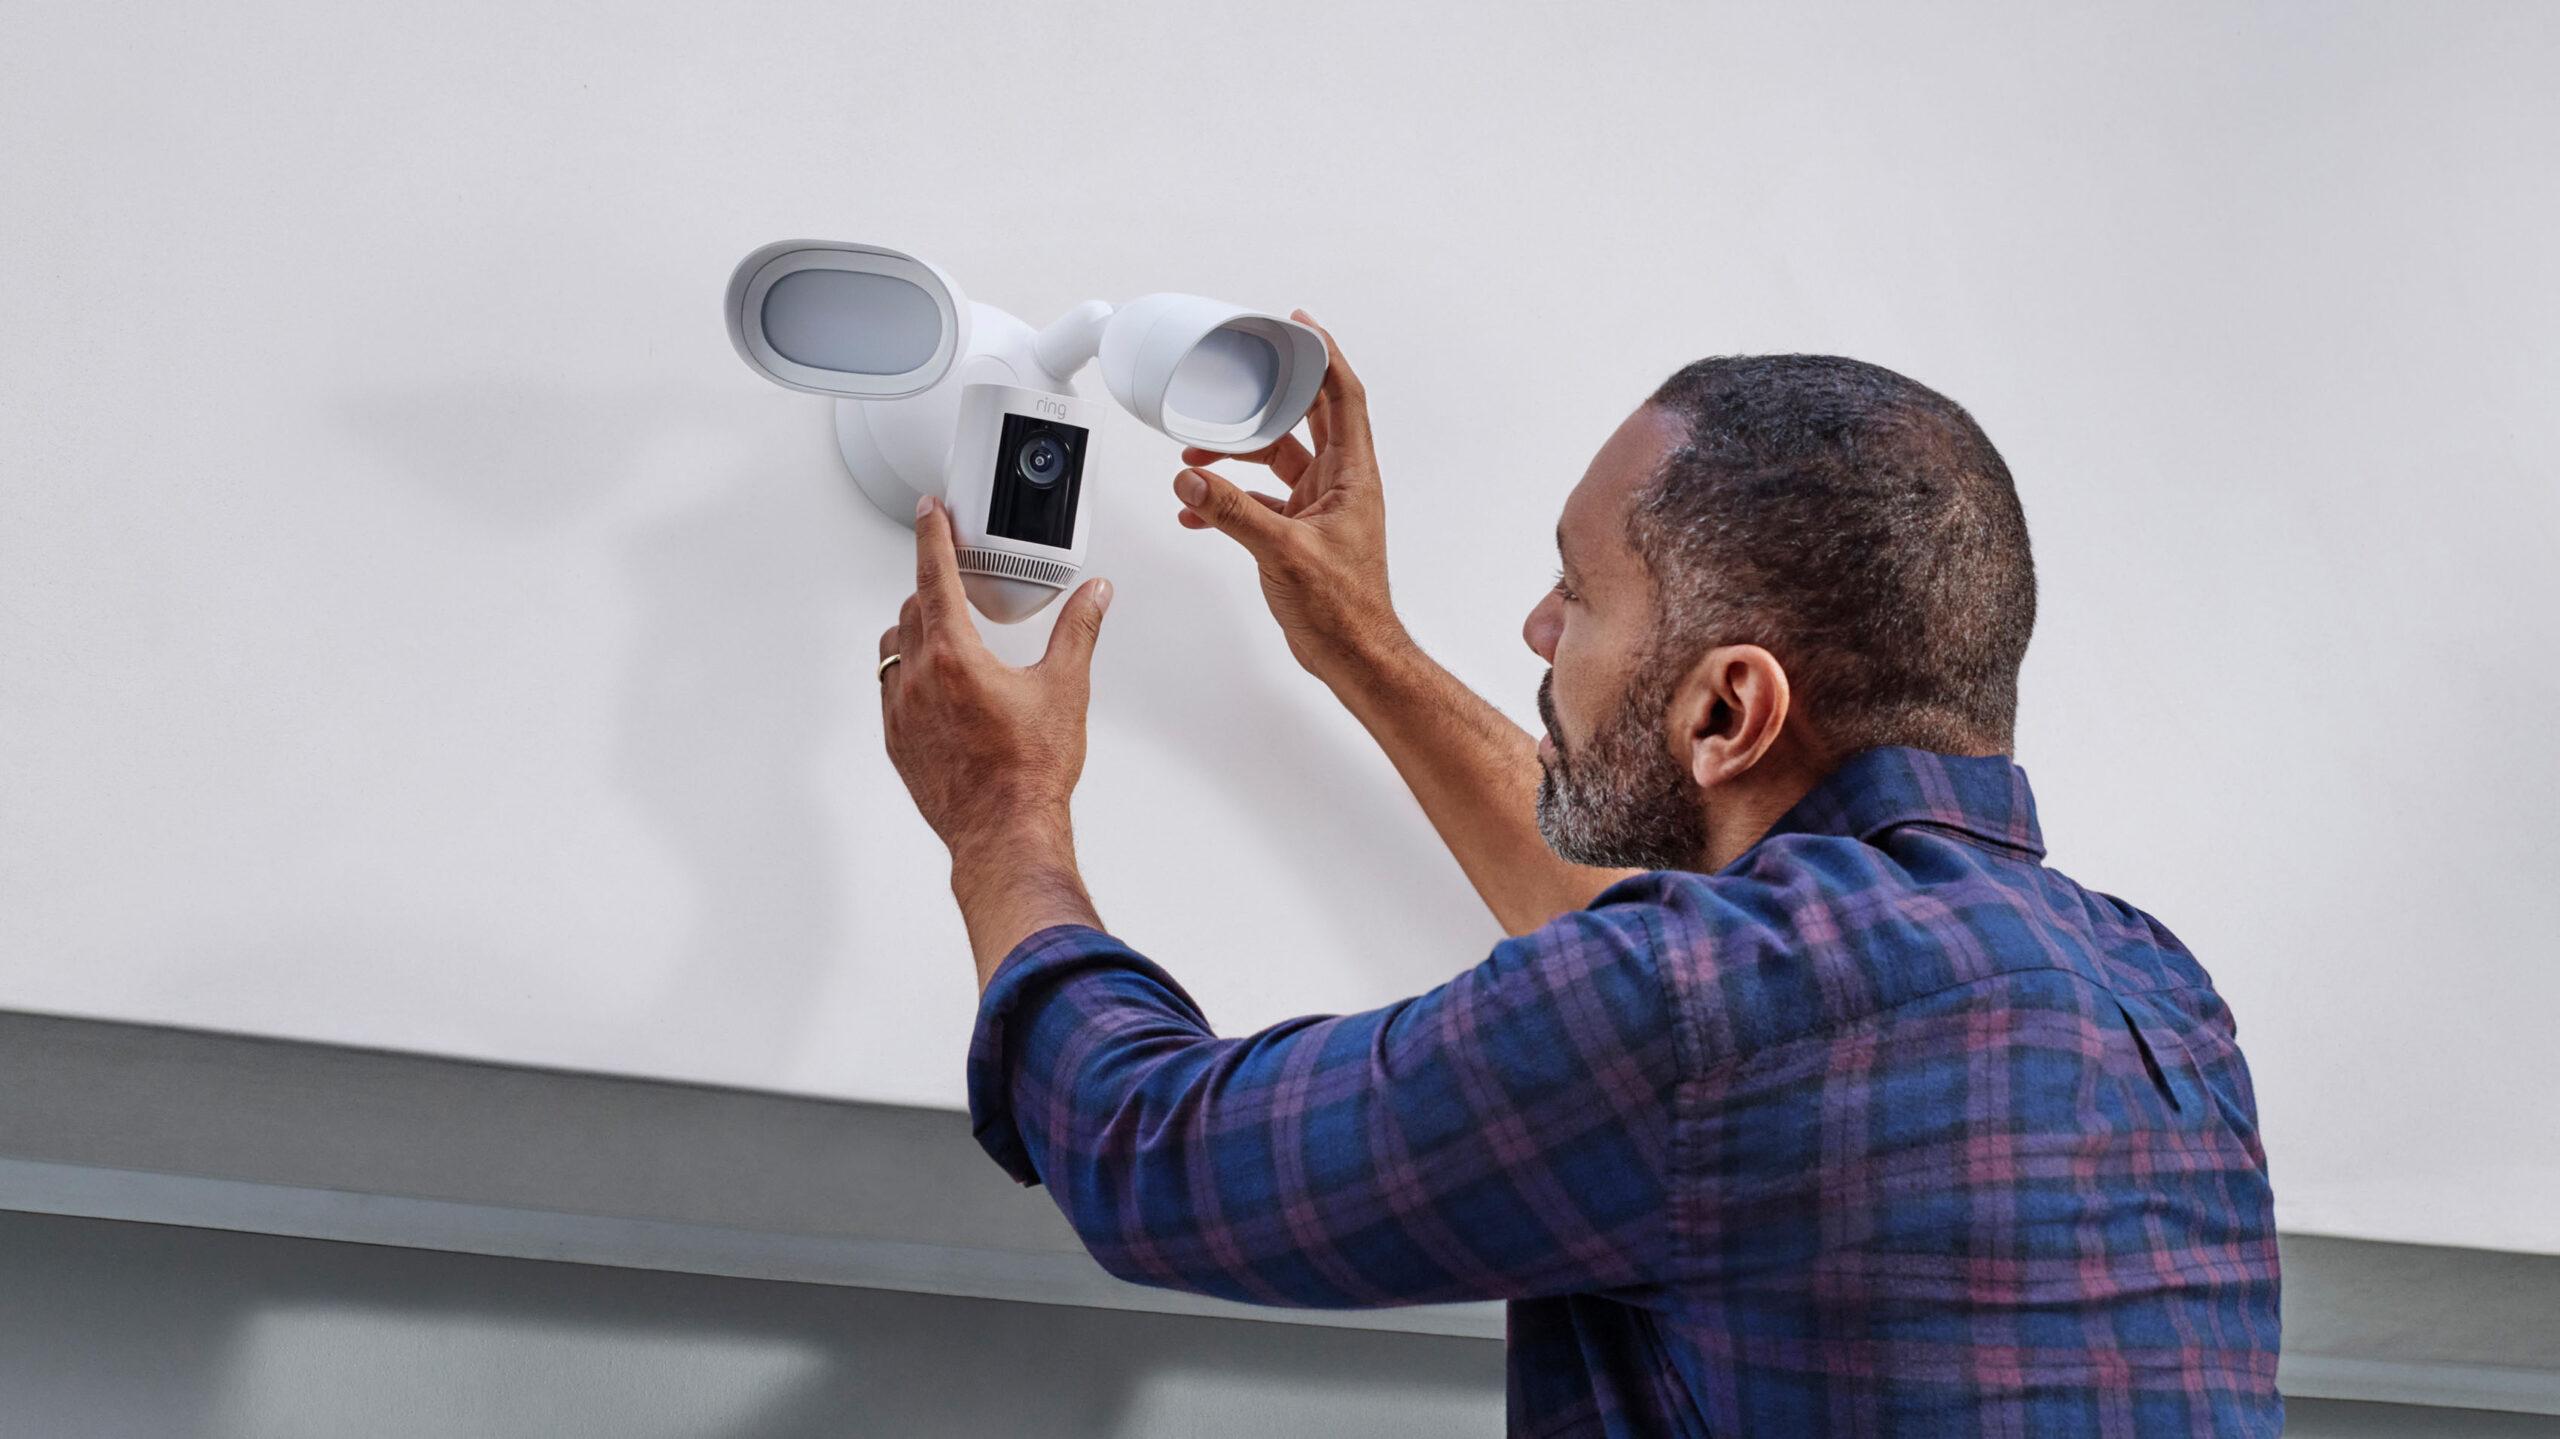 Ring Floodlight Cam Pro